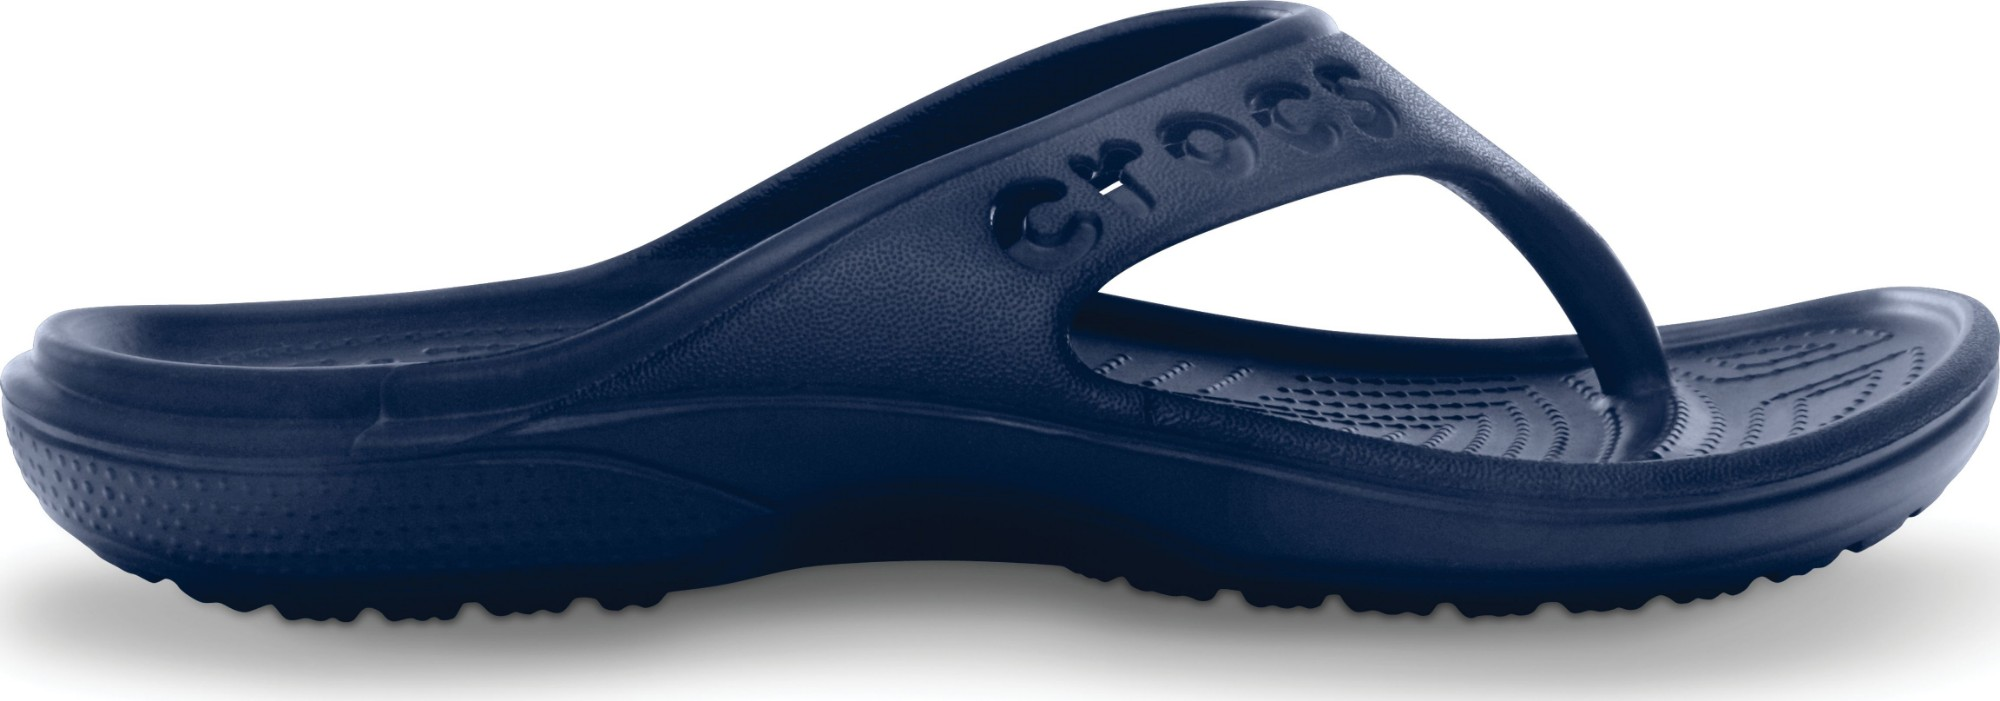 Crocs™ BAYA FLIP Navy 43,5